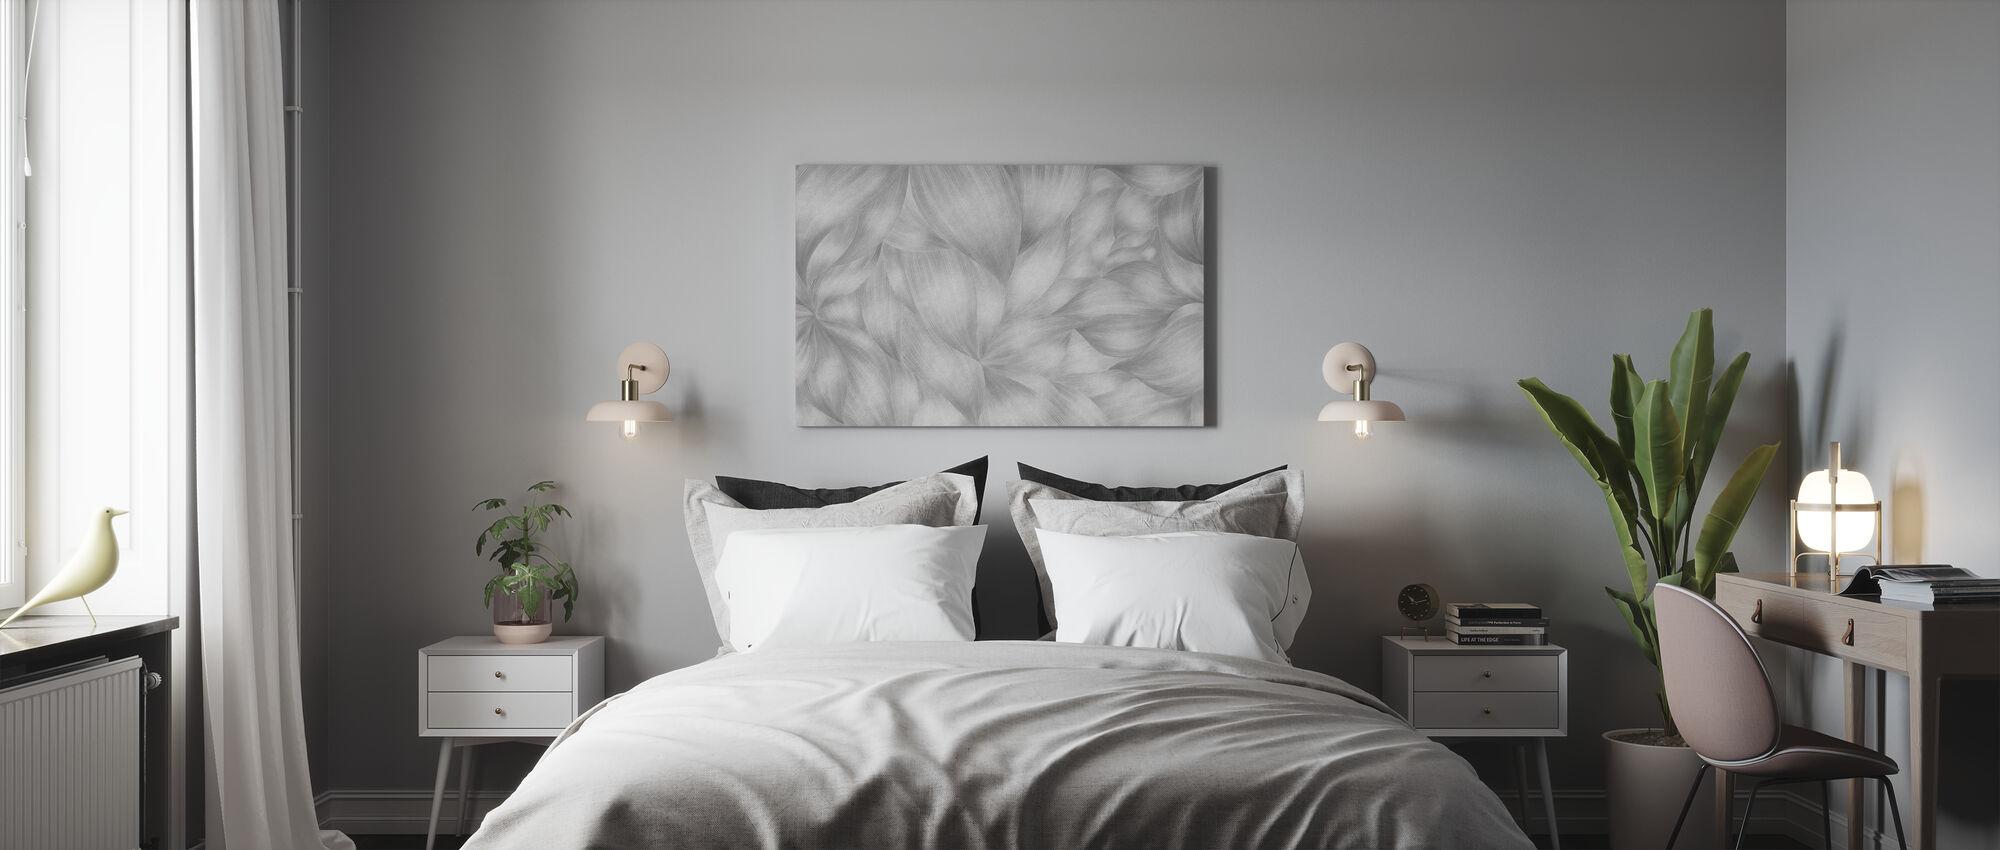 Flowing Forms II - Canvas print - Bedroom